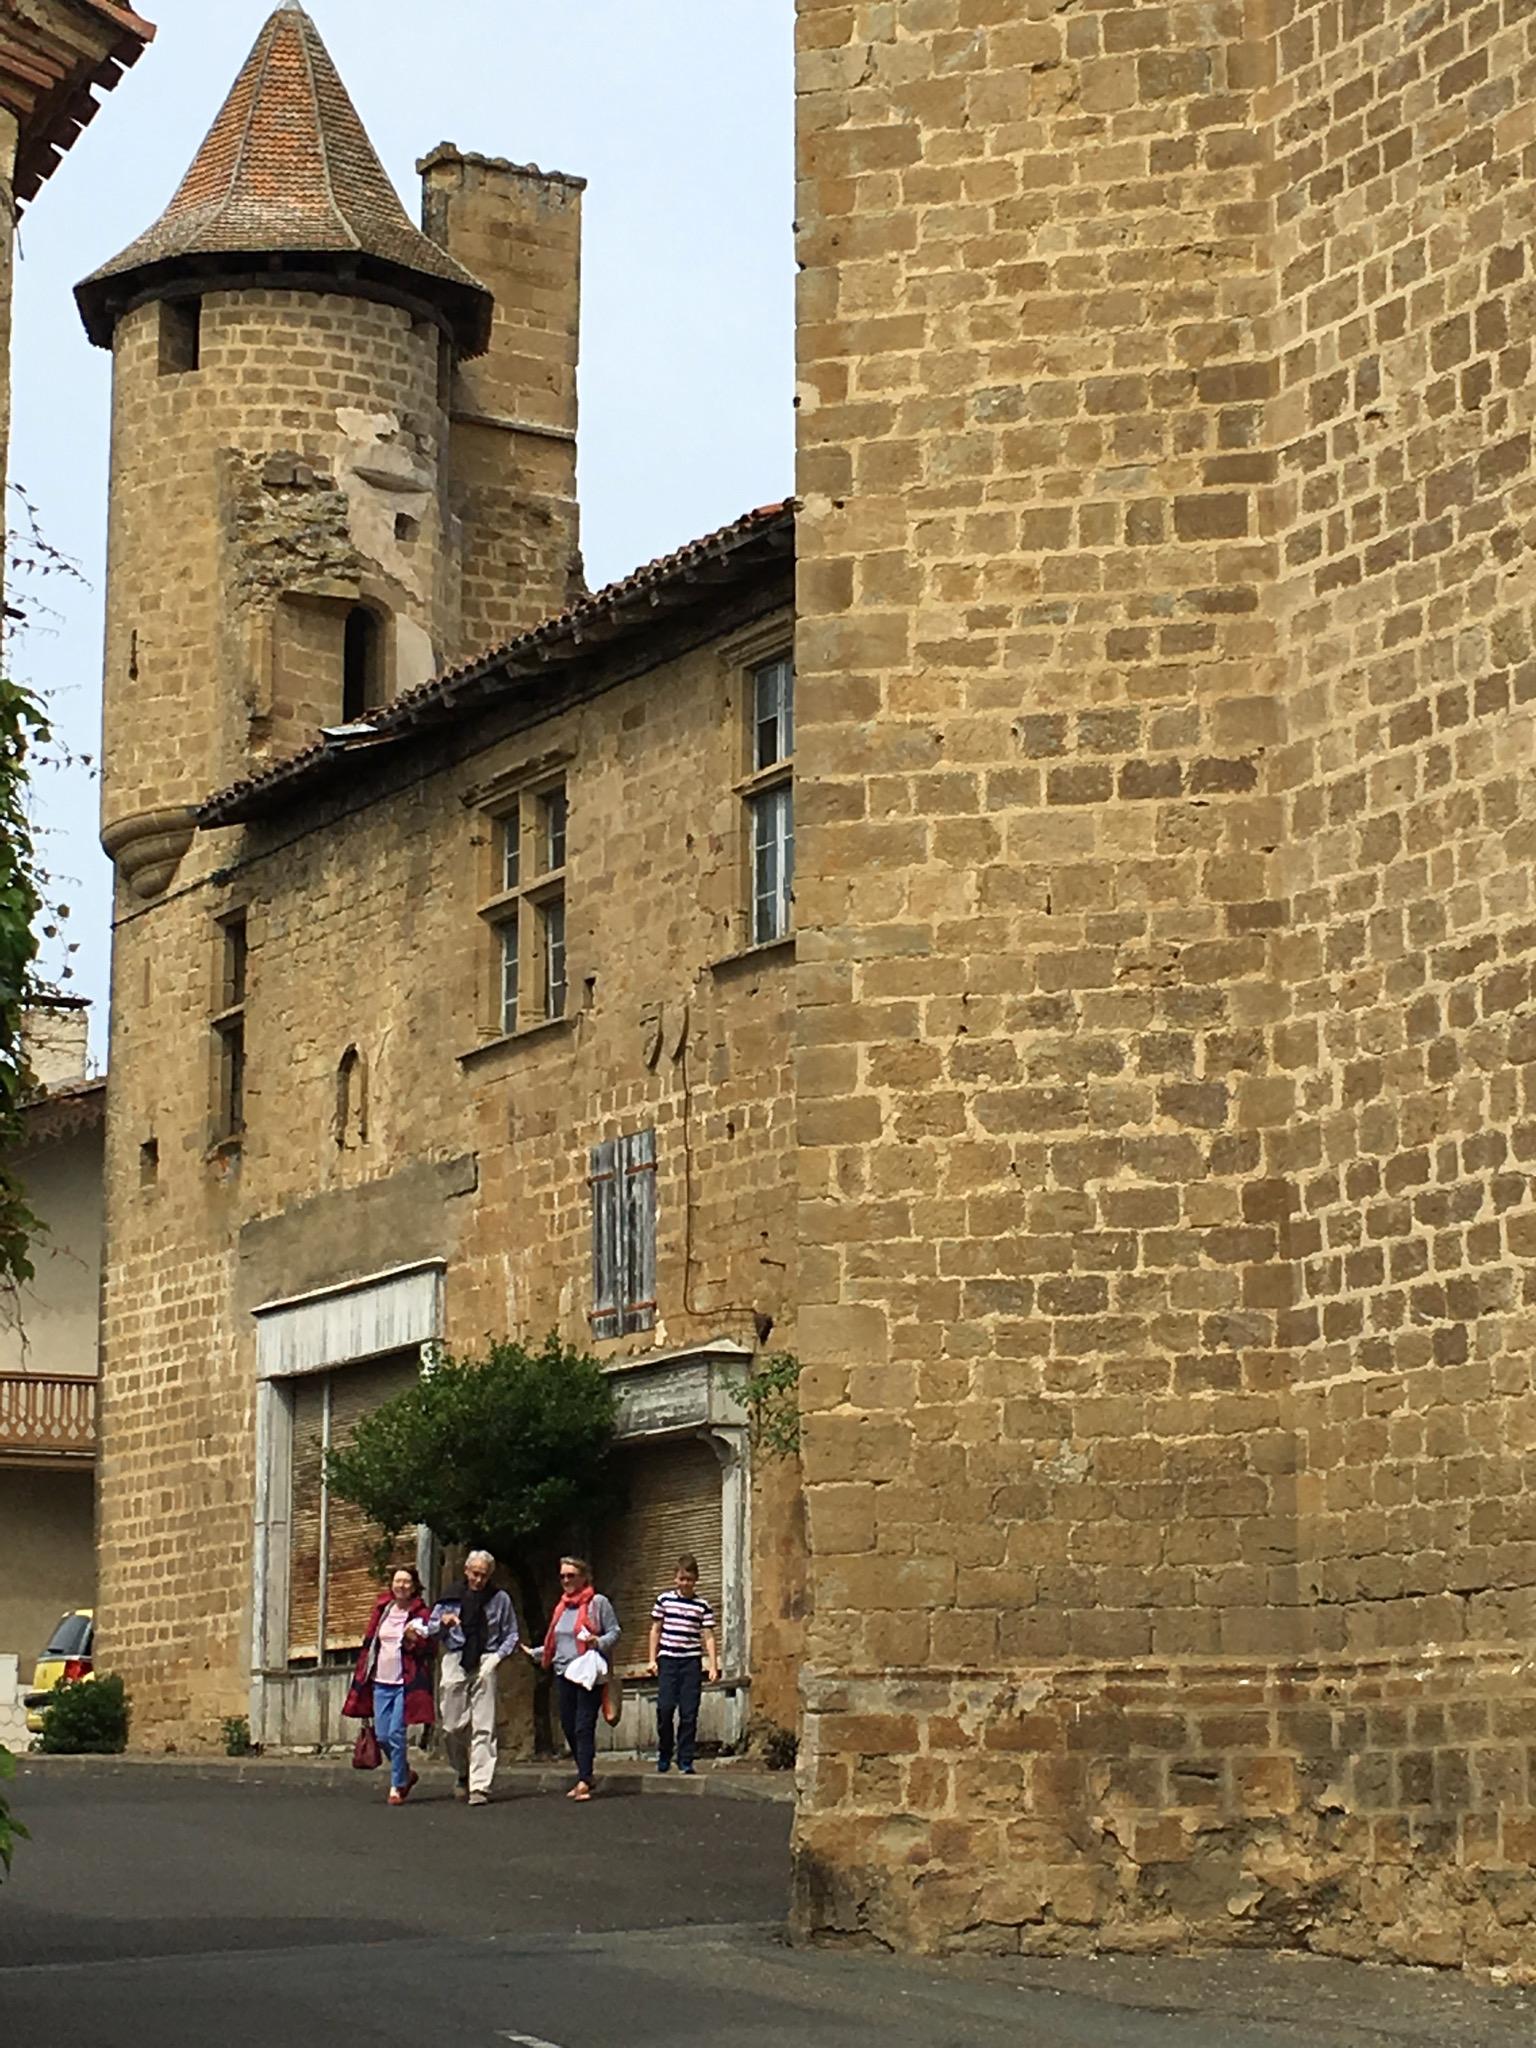 Sight Seeing 3 | Domaine du Pignoulet, Gascony, France